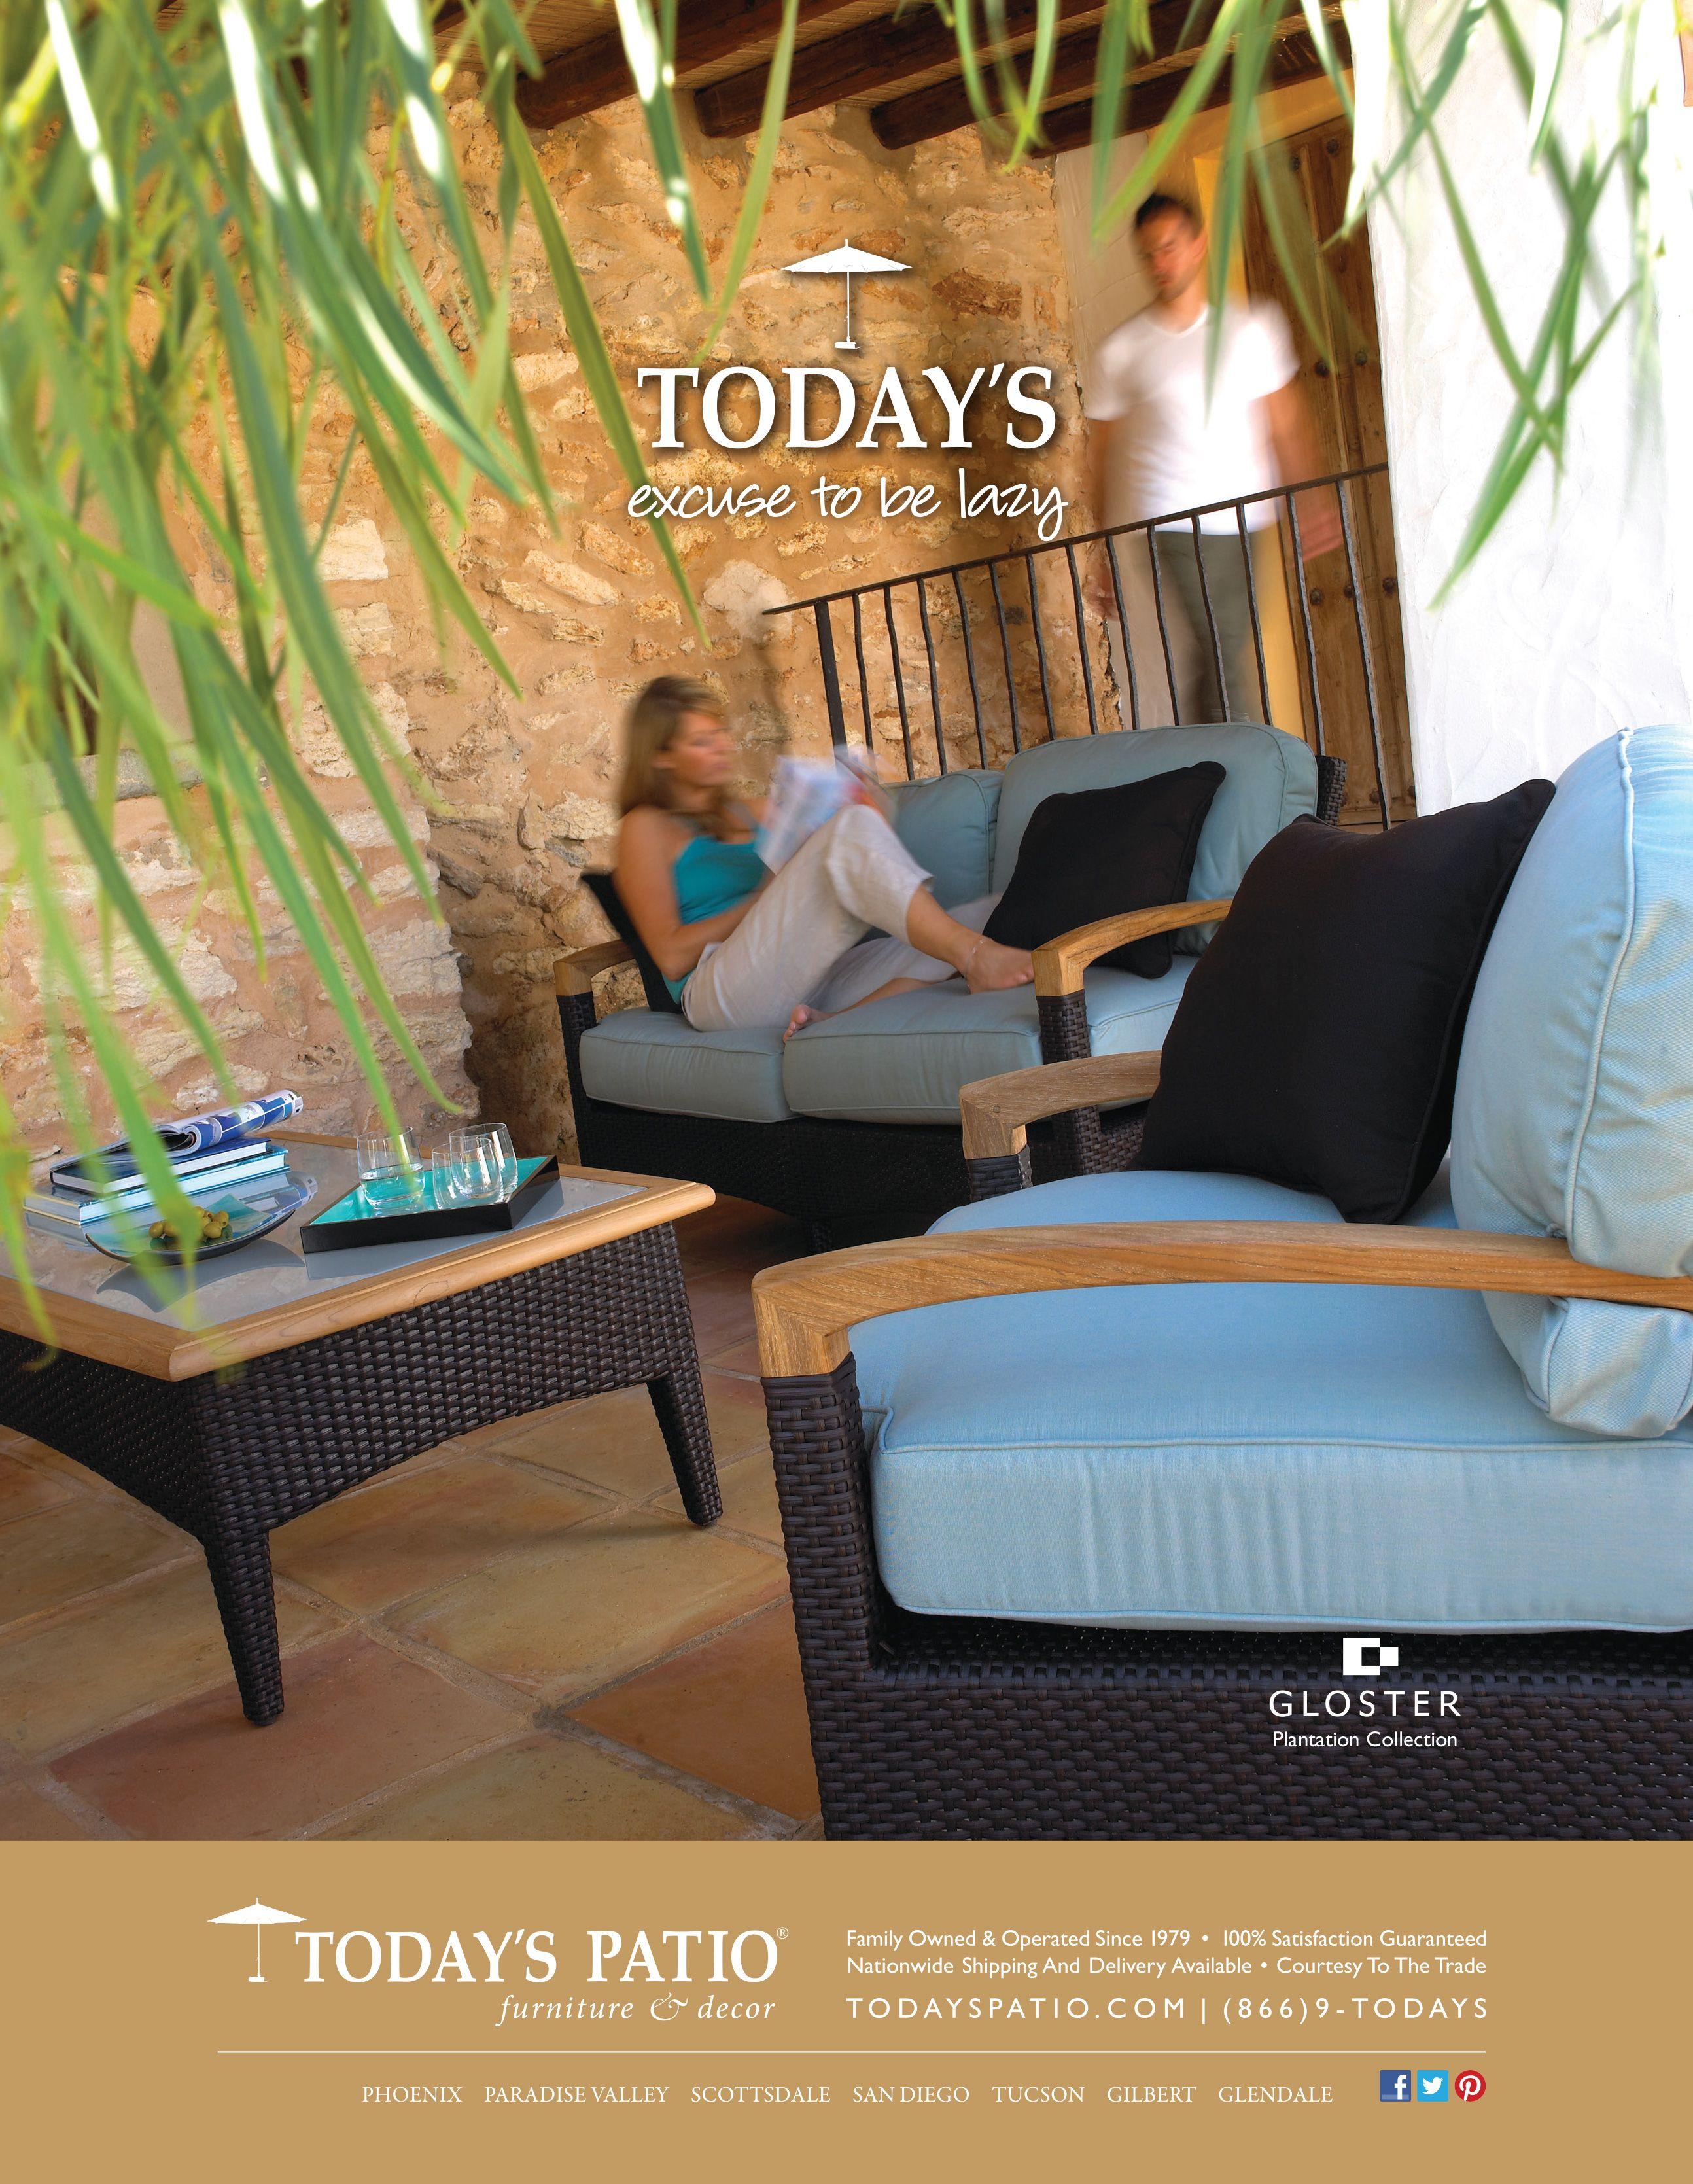 Patio Furniture Atlanta Furniture Ideas Pinterest